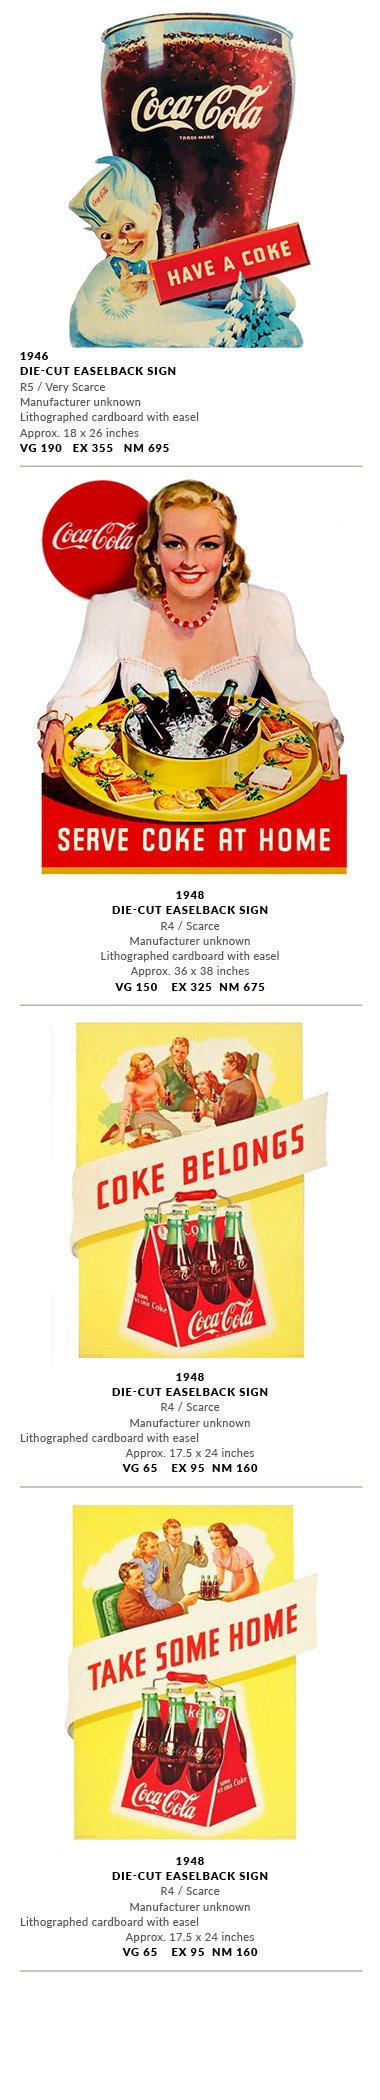 1930-1949DieCutsPHONE_13.jpg